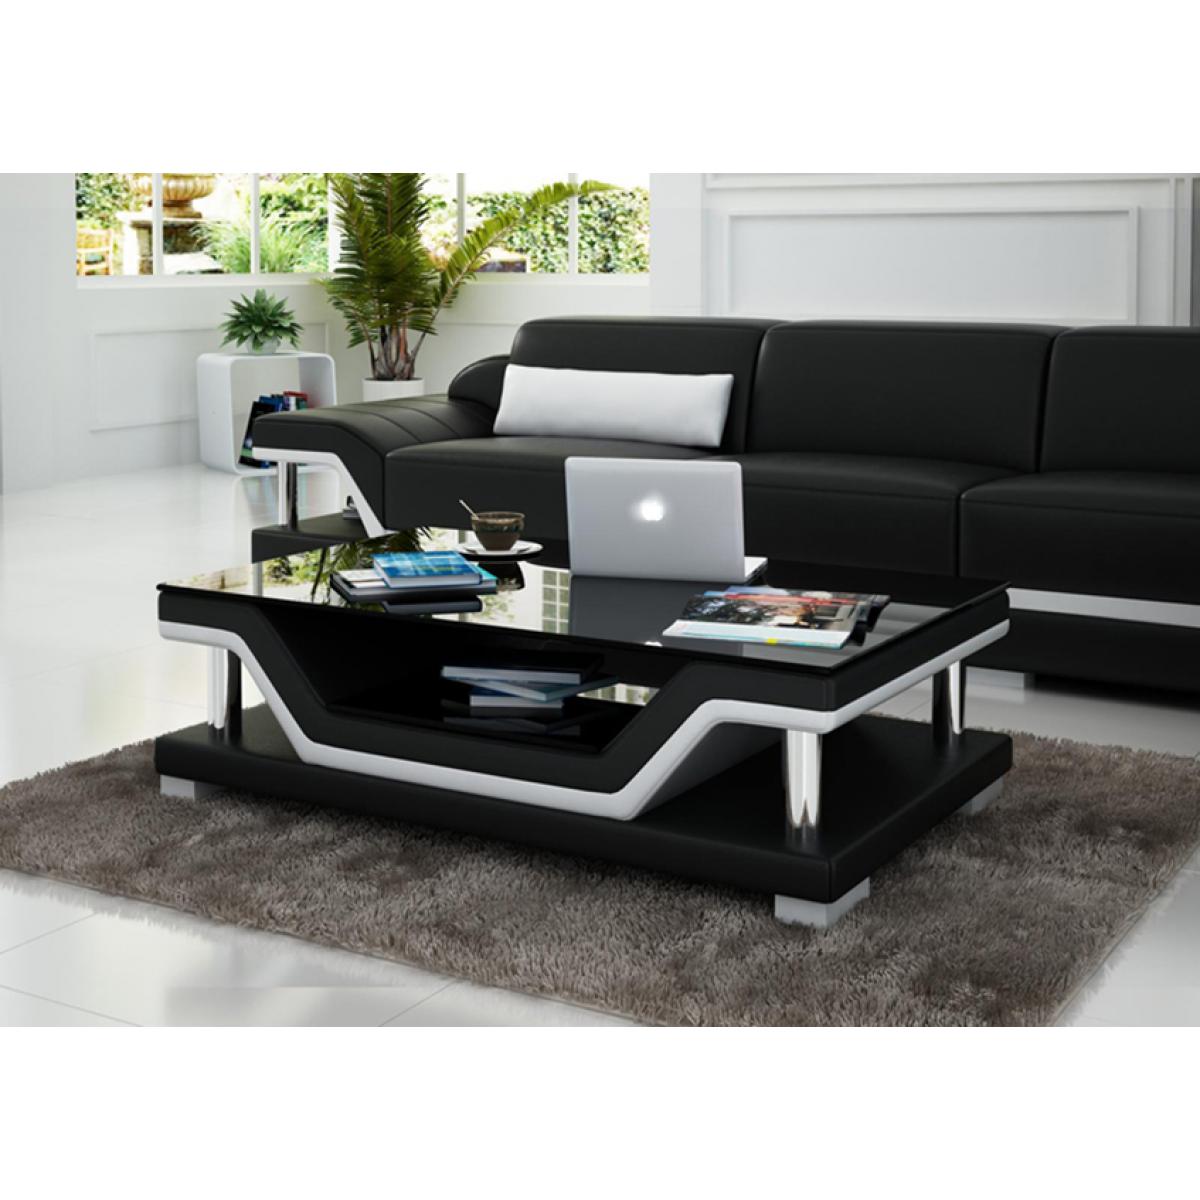 Table basse design milano pop - Destockage table basse ...